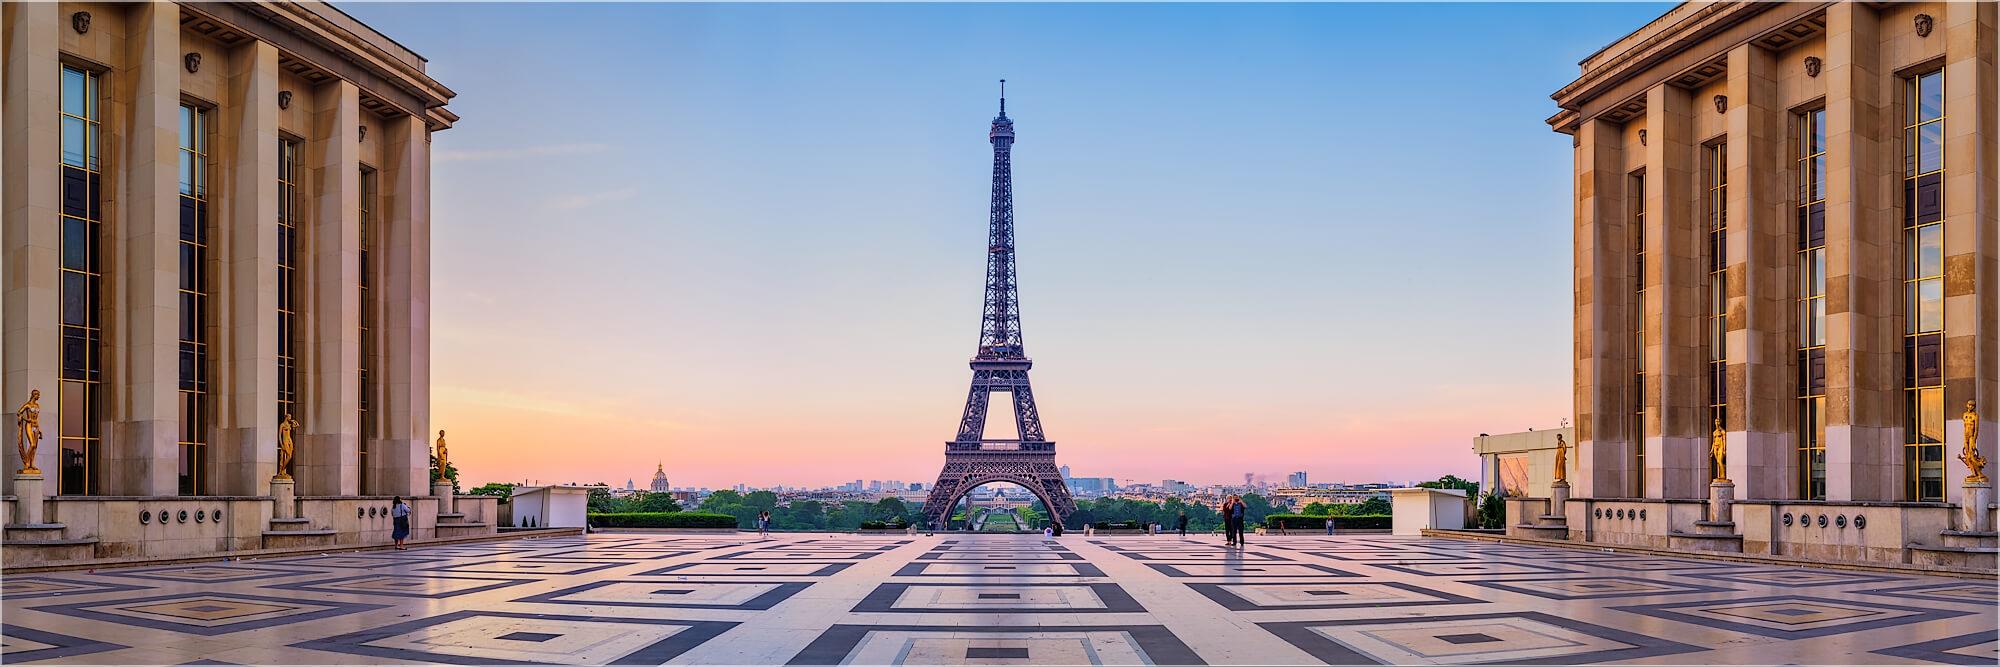 Panoramabild morgens am Trocadero Paris Frankreich